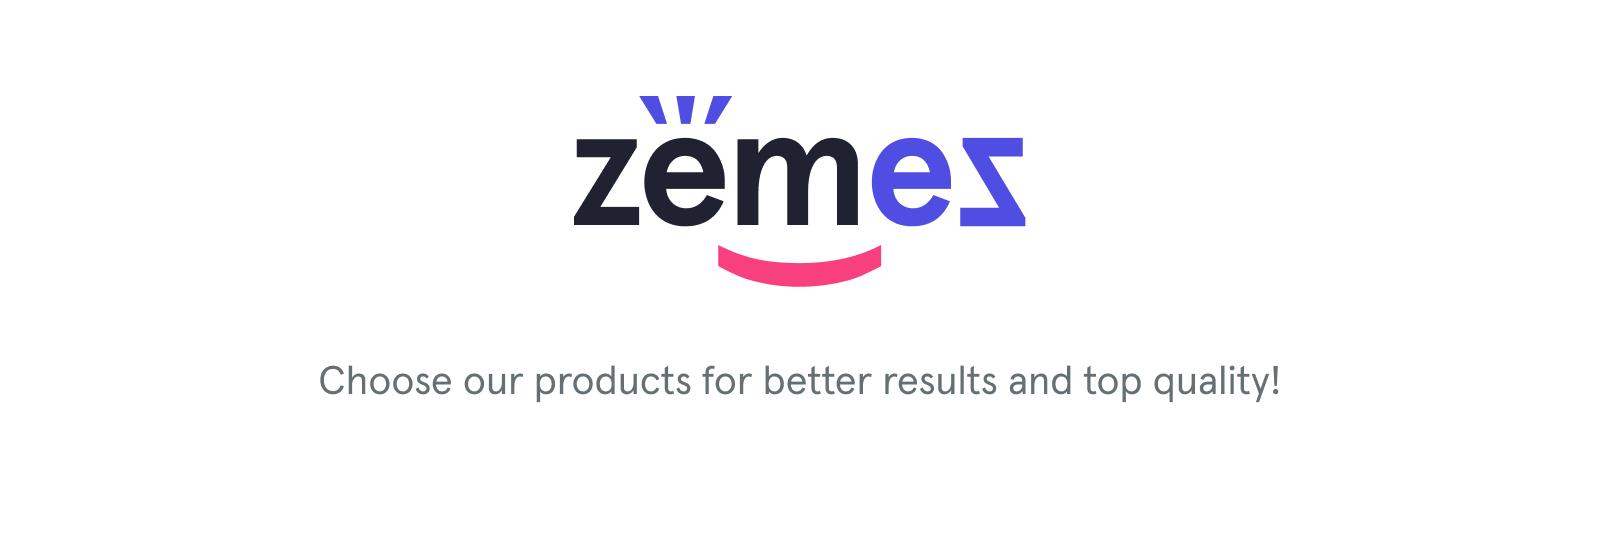 Edem - Night Club Multipurpose Modern Elementor WordPress Theme